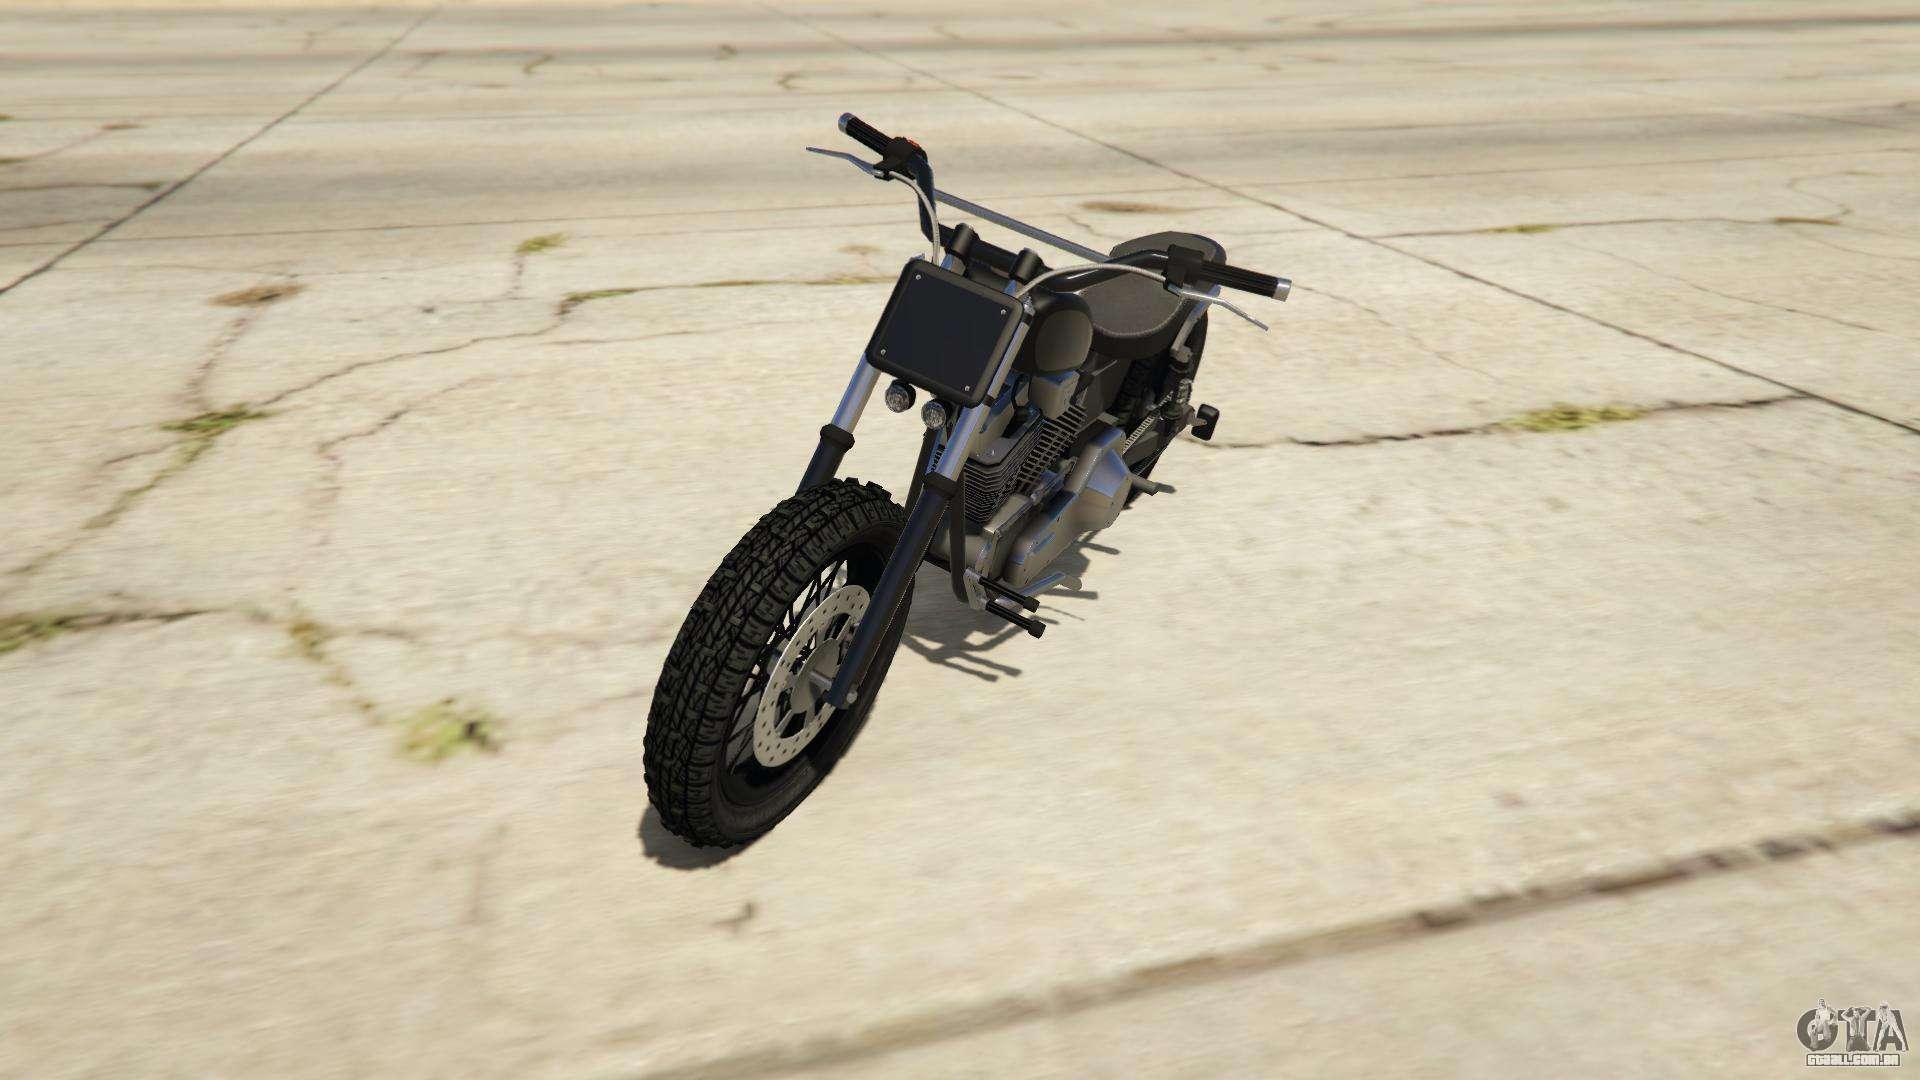 Western Motorcycle Company Cliffhanger do GTA Online - vista frontal